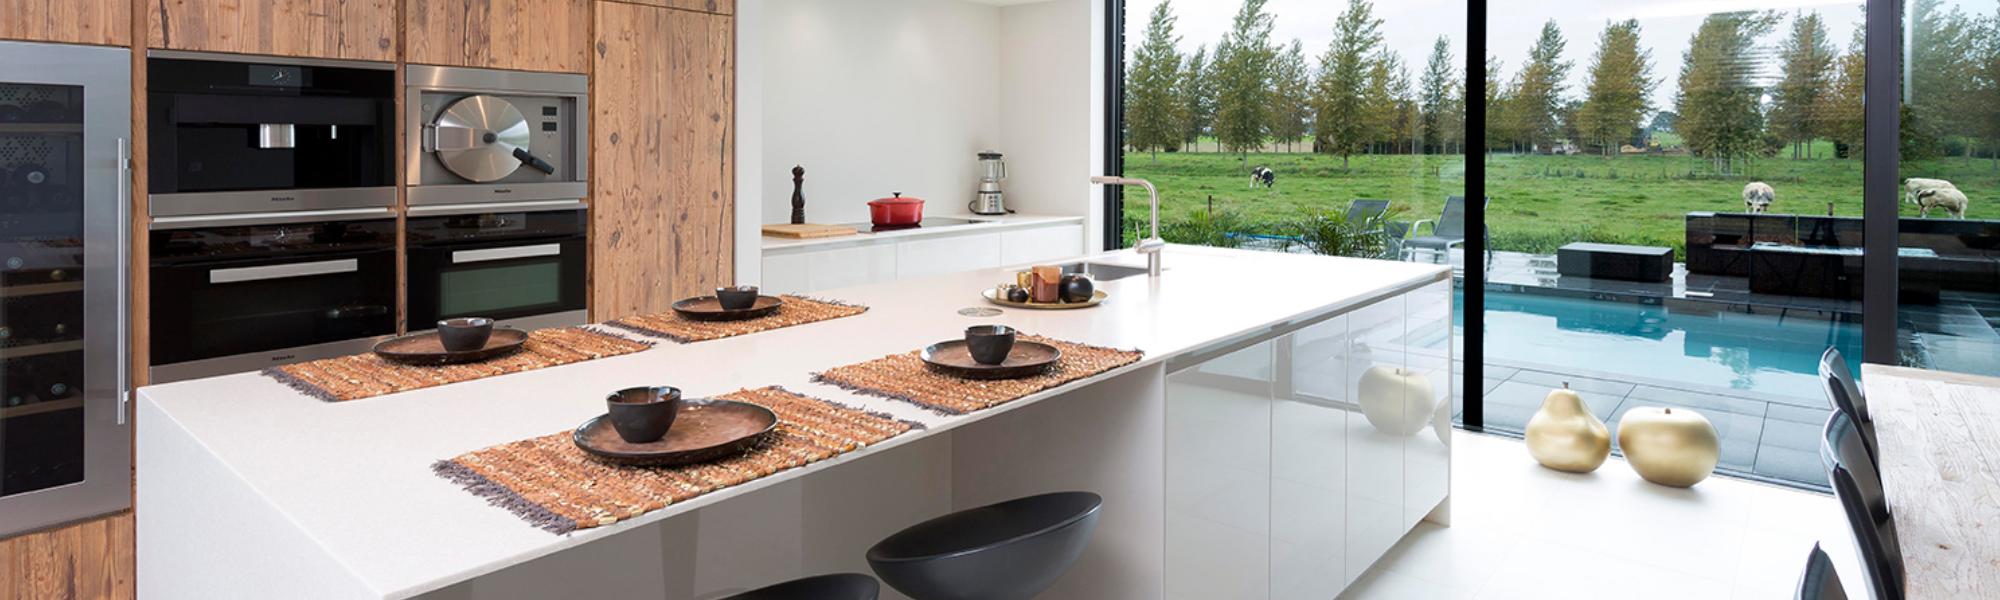 Keuken en interieur Jongen Sint-Truiden : Homepage | Keukens Jongen